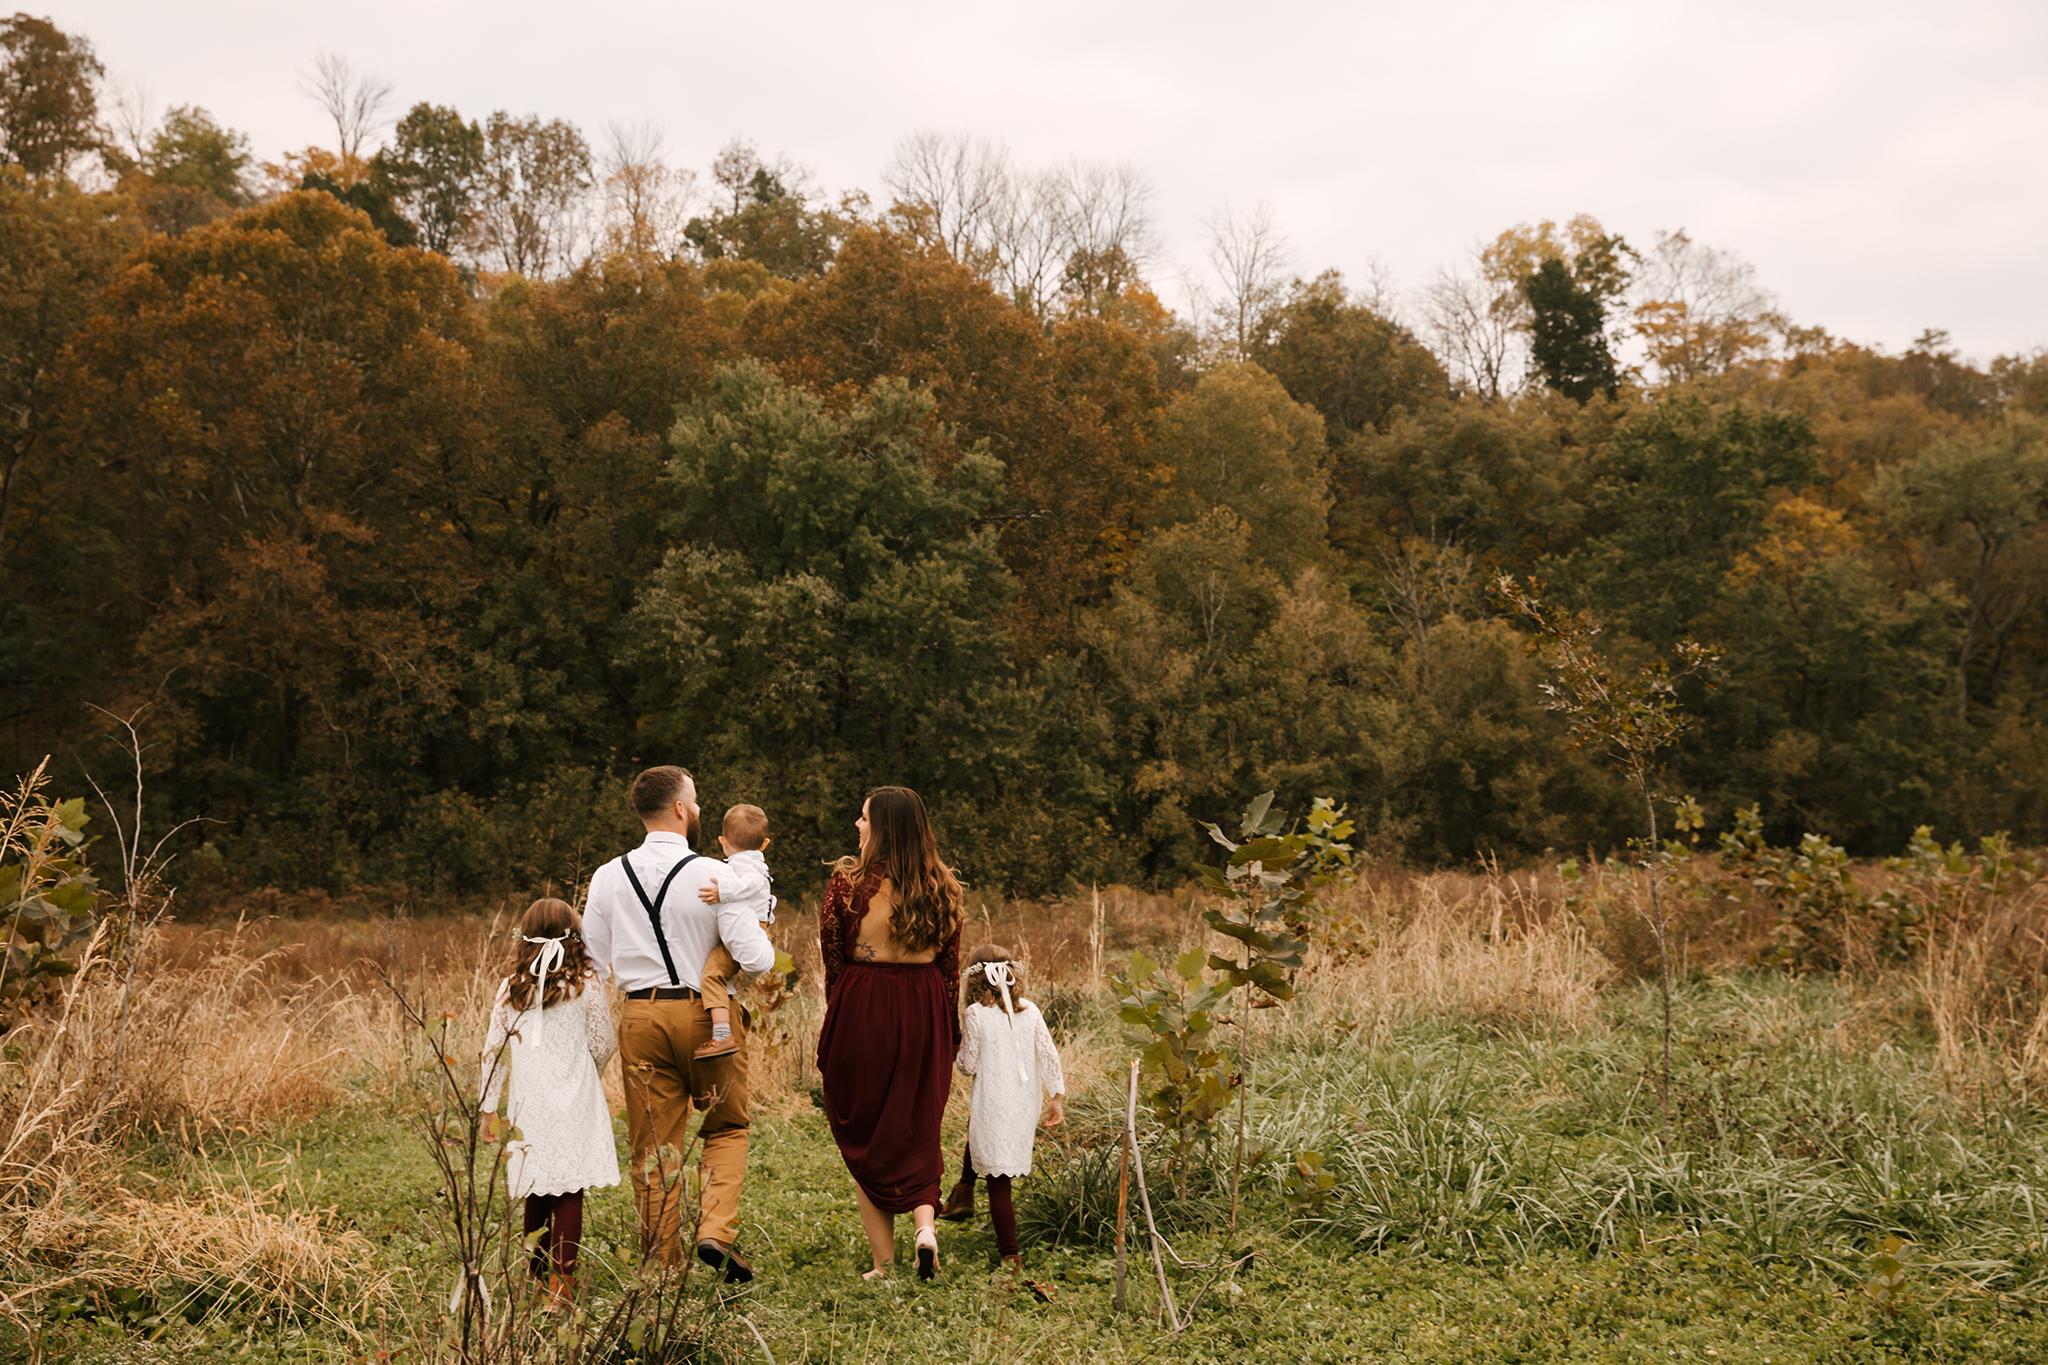 Red-Photographic-Wedding-Kentucky-Cisar-23.JPG